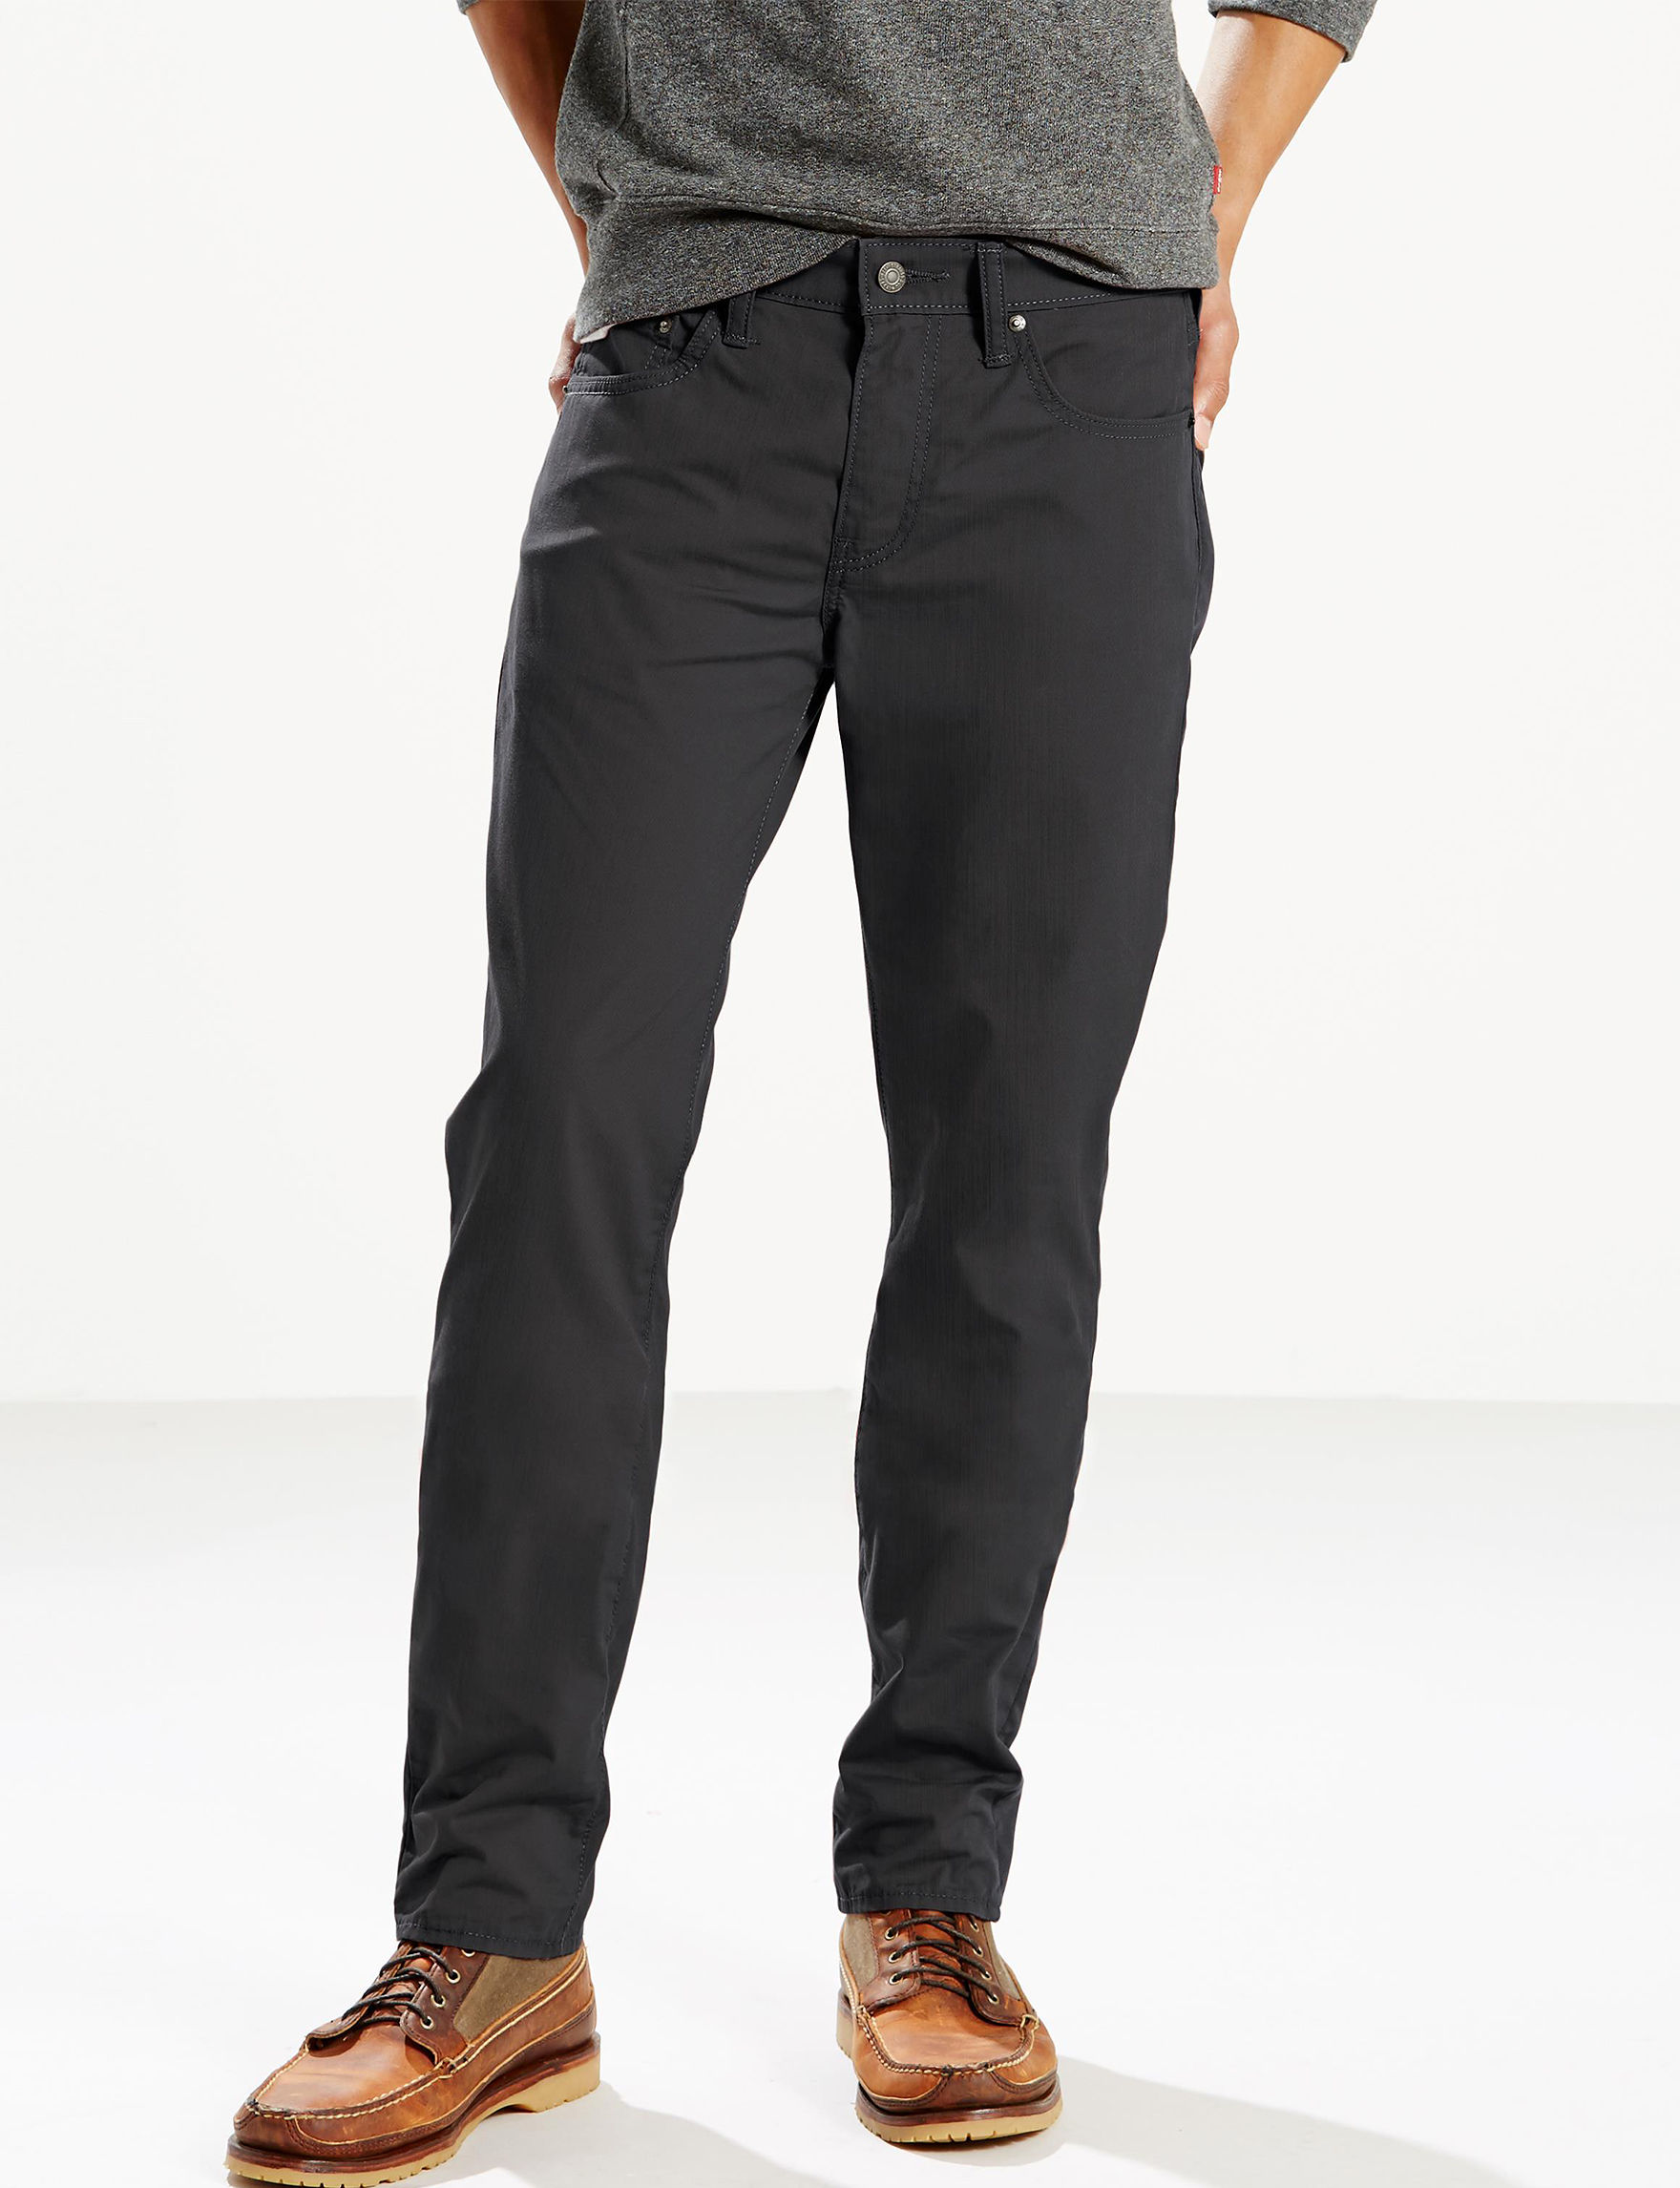 Levi's Black Slim